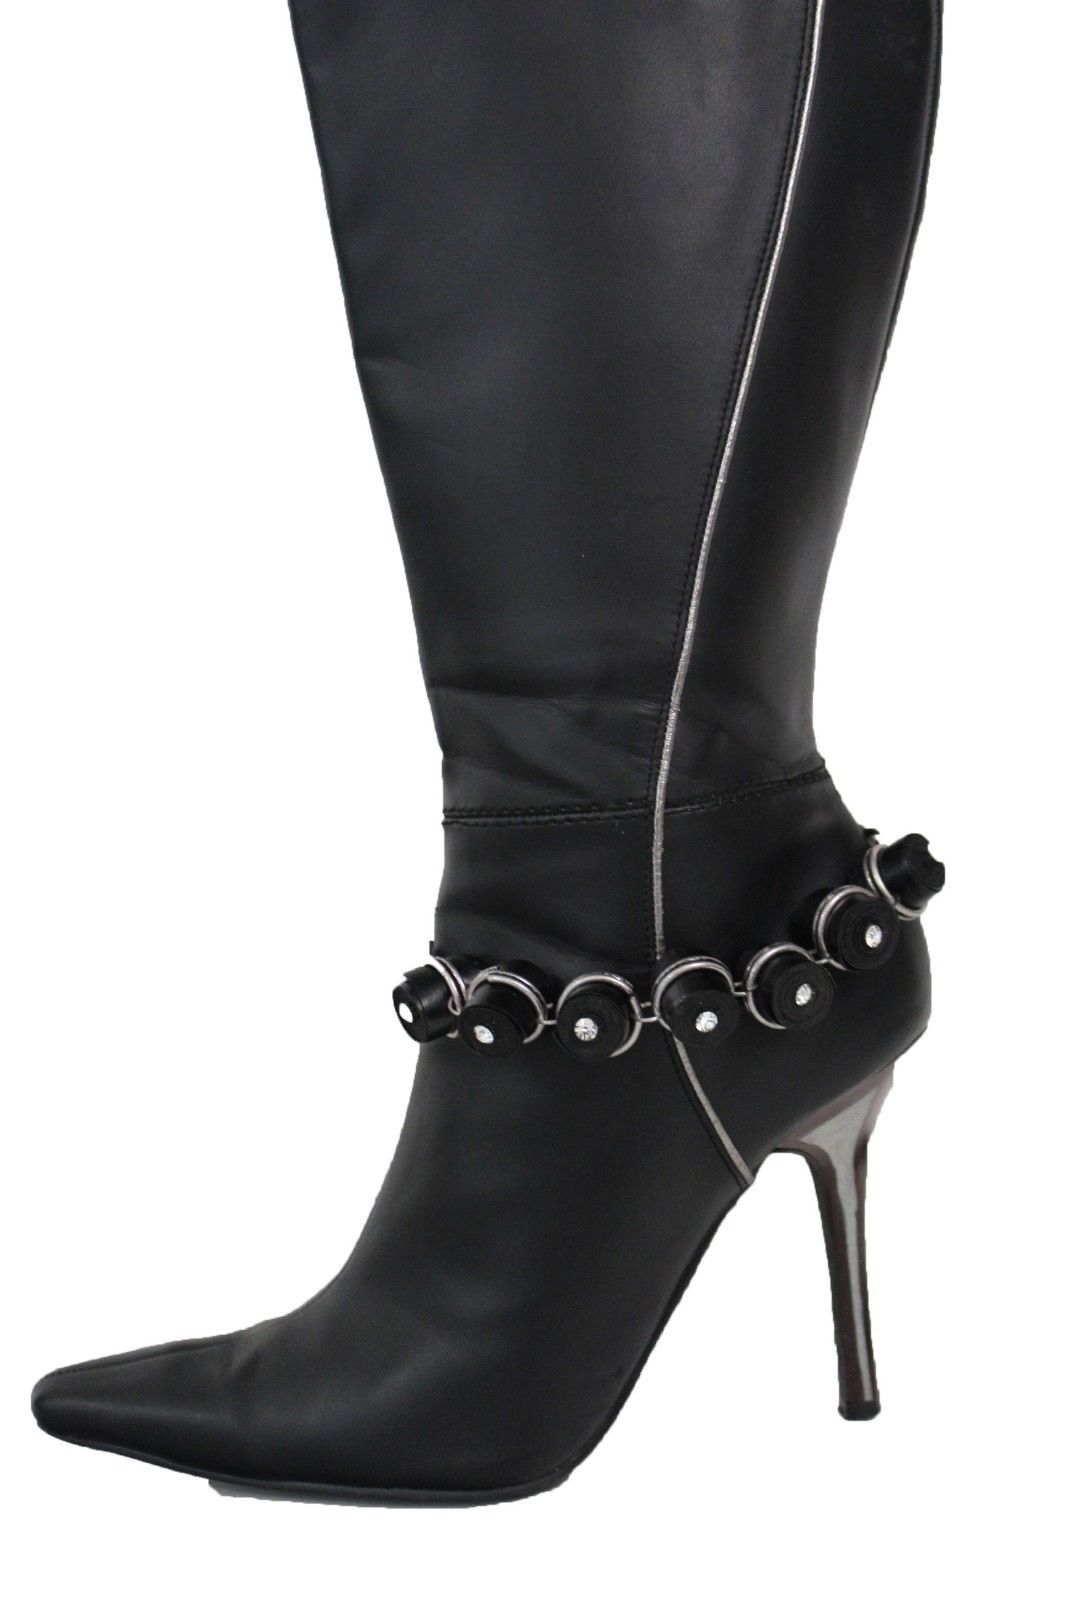 Women Silver Metal Chains Boot Bracelet High Heel Shoe Charm Bling Black Stripes